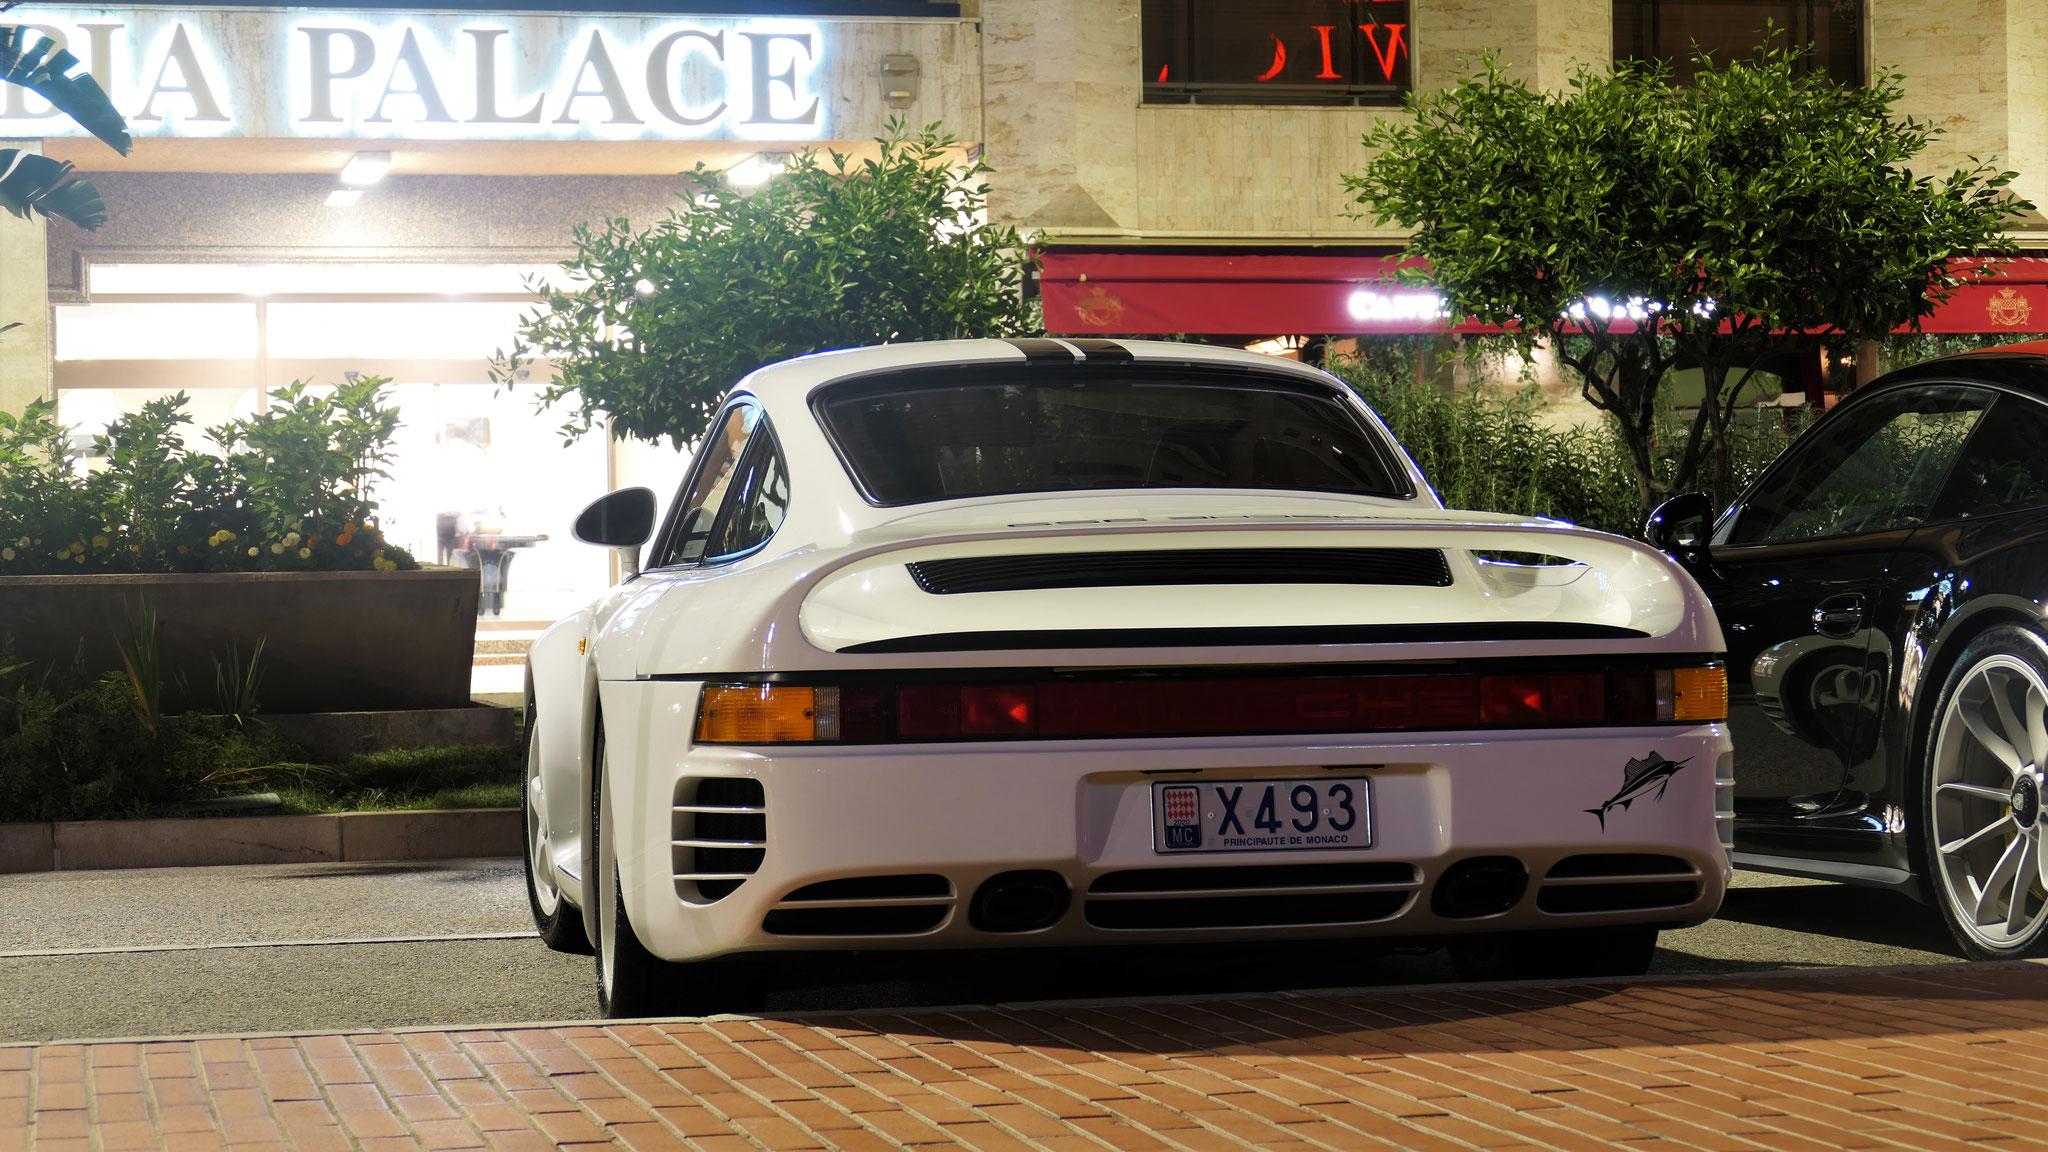 Porsche 959 - X493 (MC)